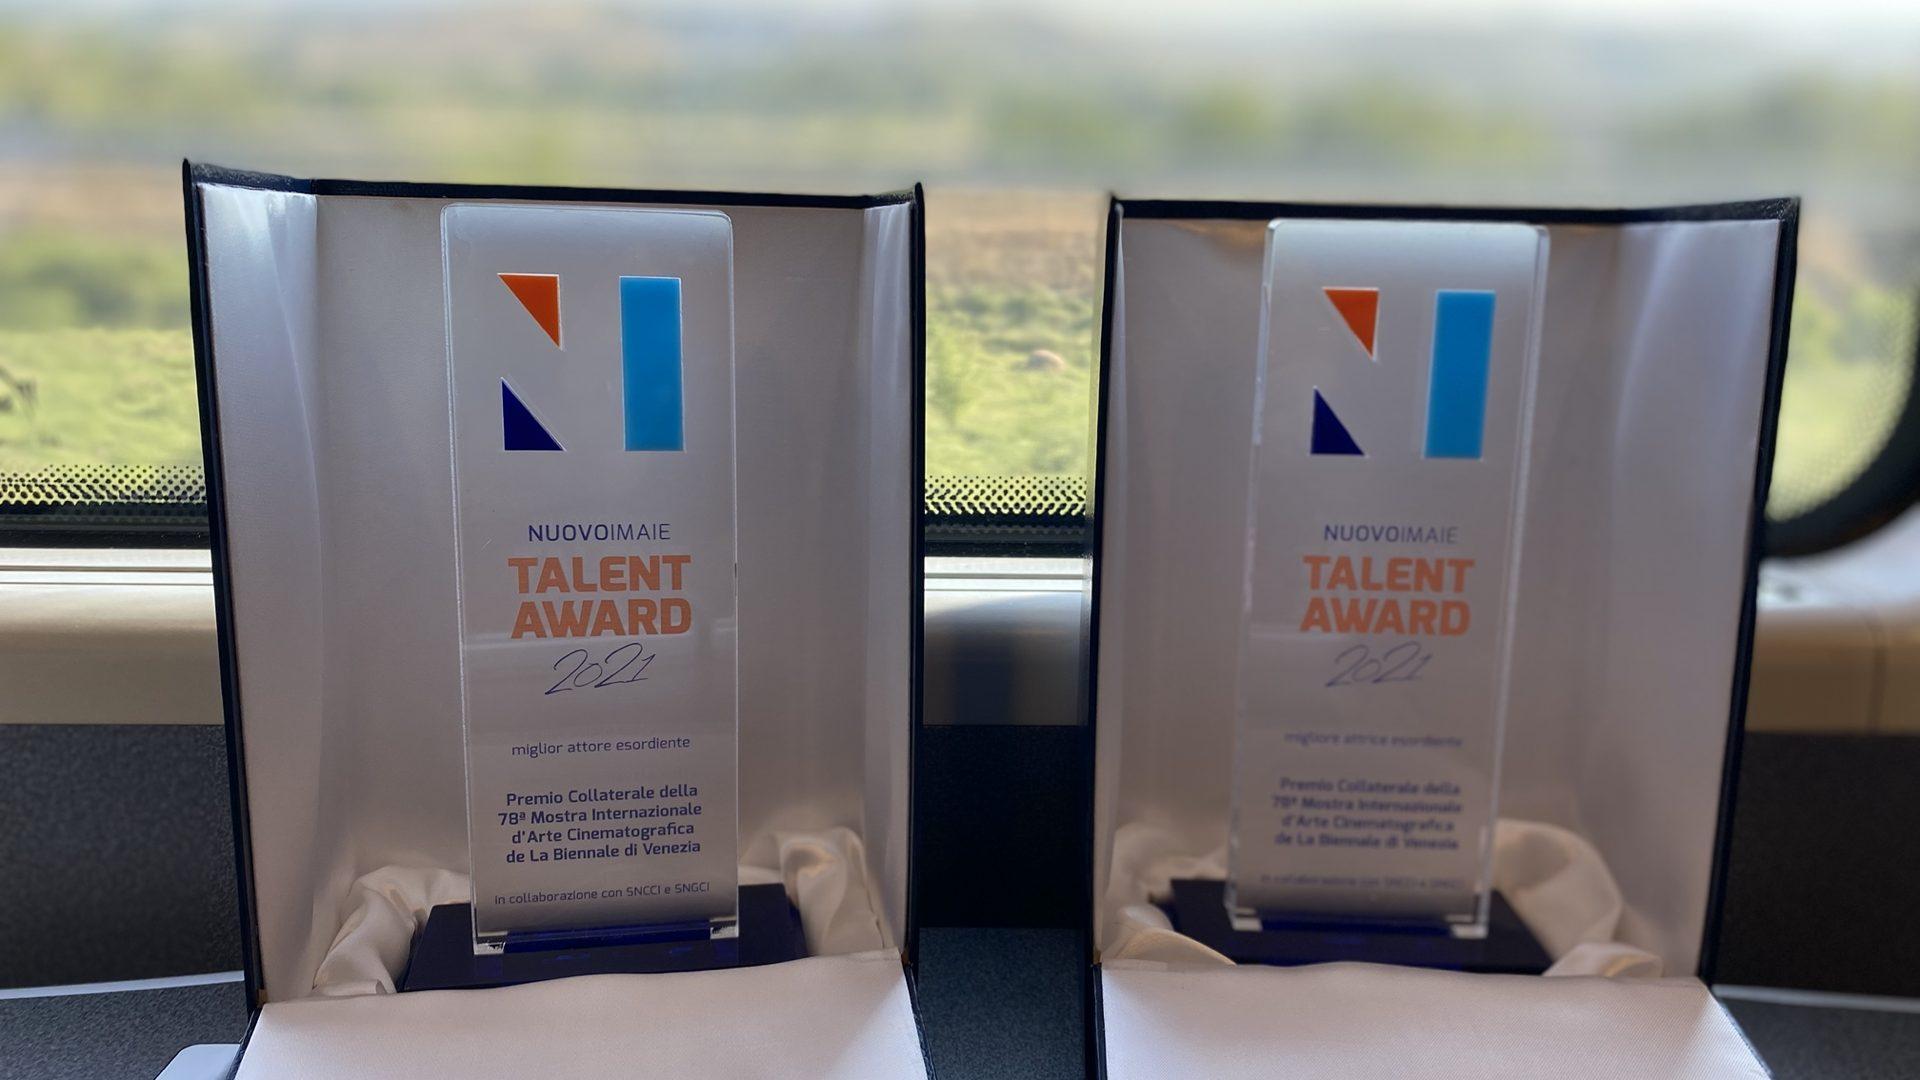 Venezia: il NUOVO IMAIE Talent Award si avvicina! 🚇 😉